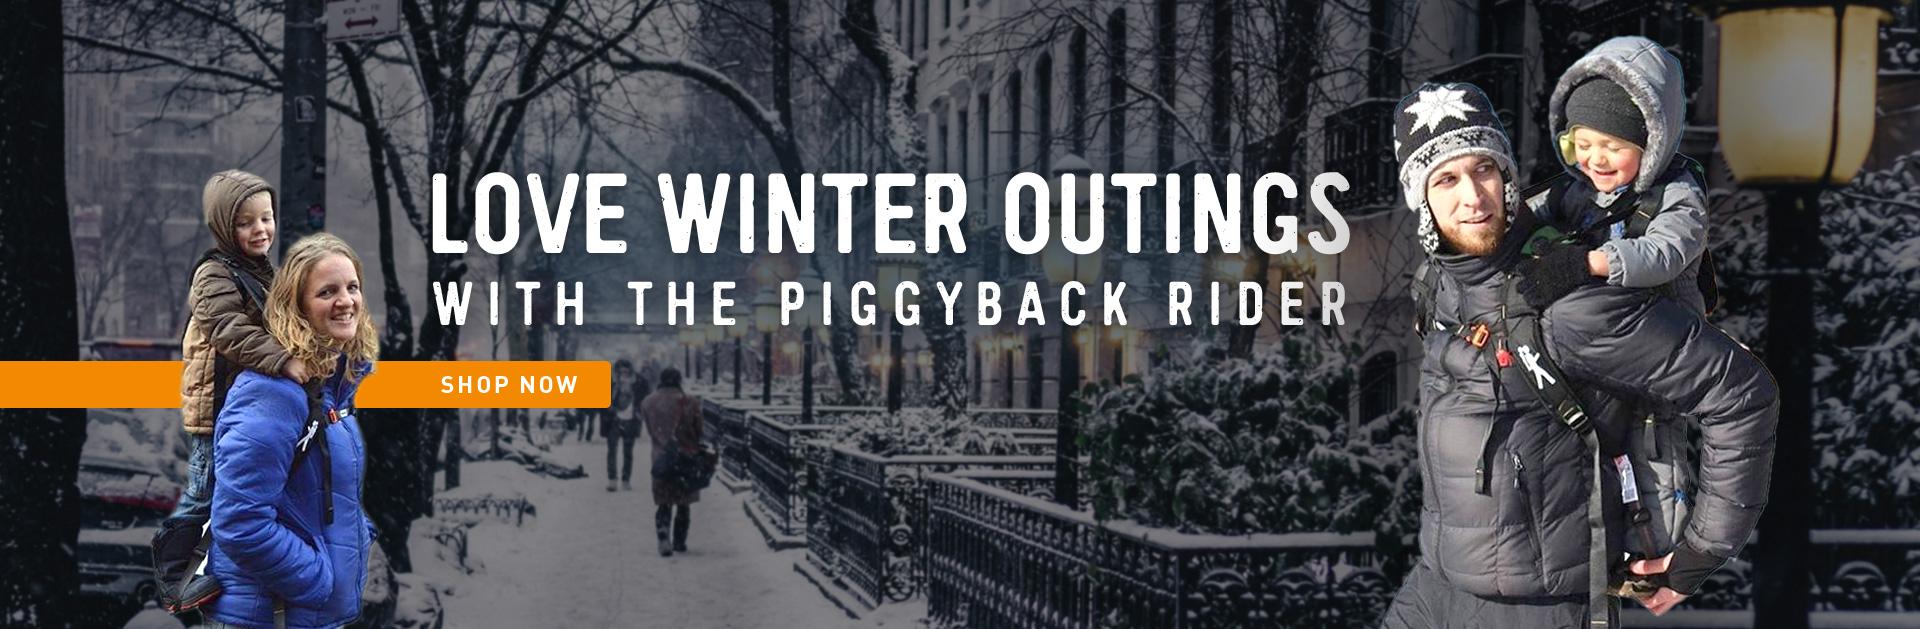 b0add023ad6 Toddler child carrier backpacks piggyback rider jpg 1920x629 Piggyback  carrier